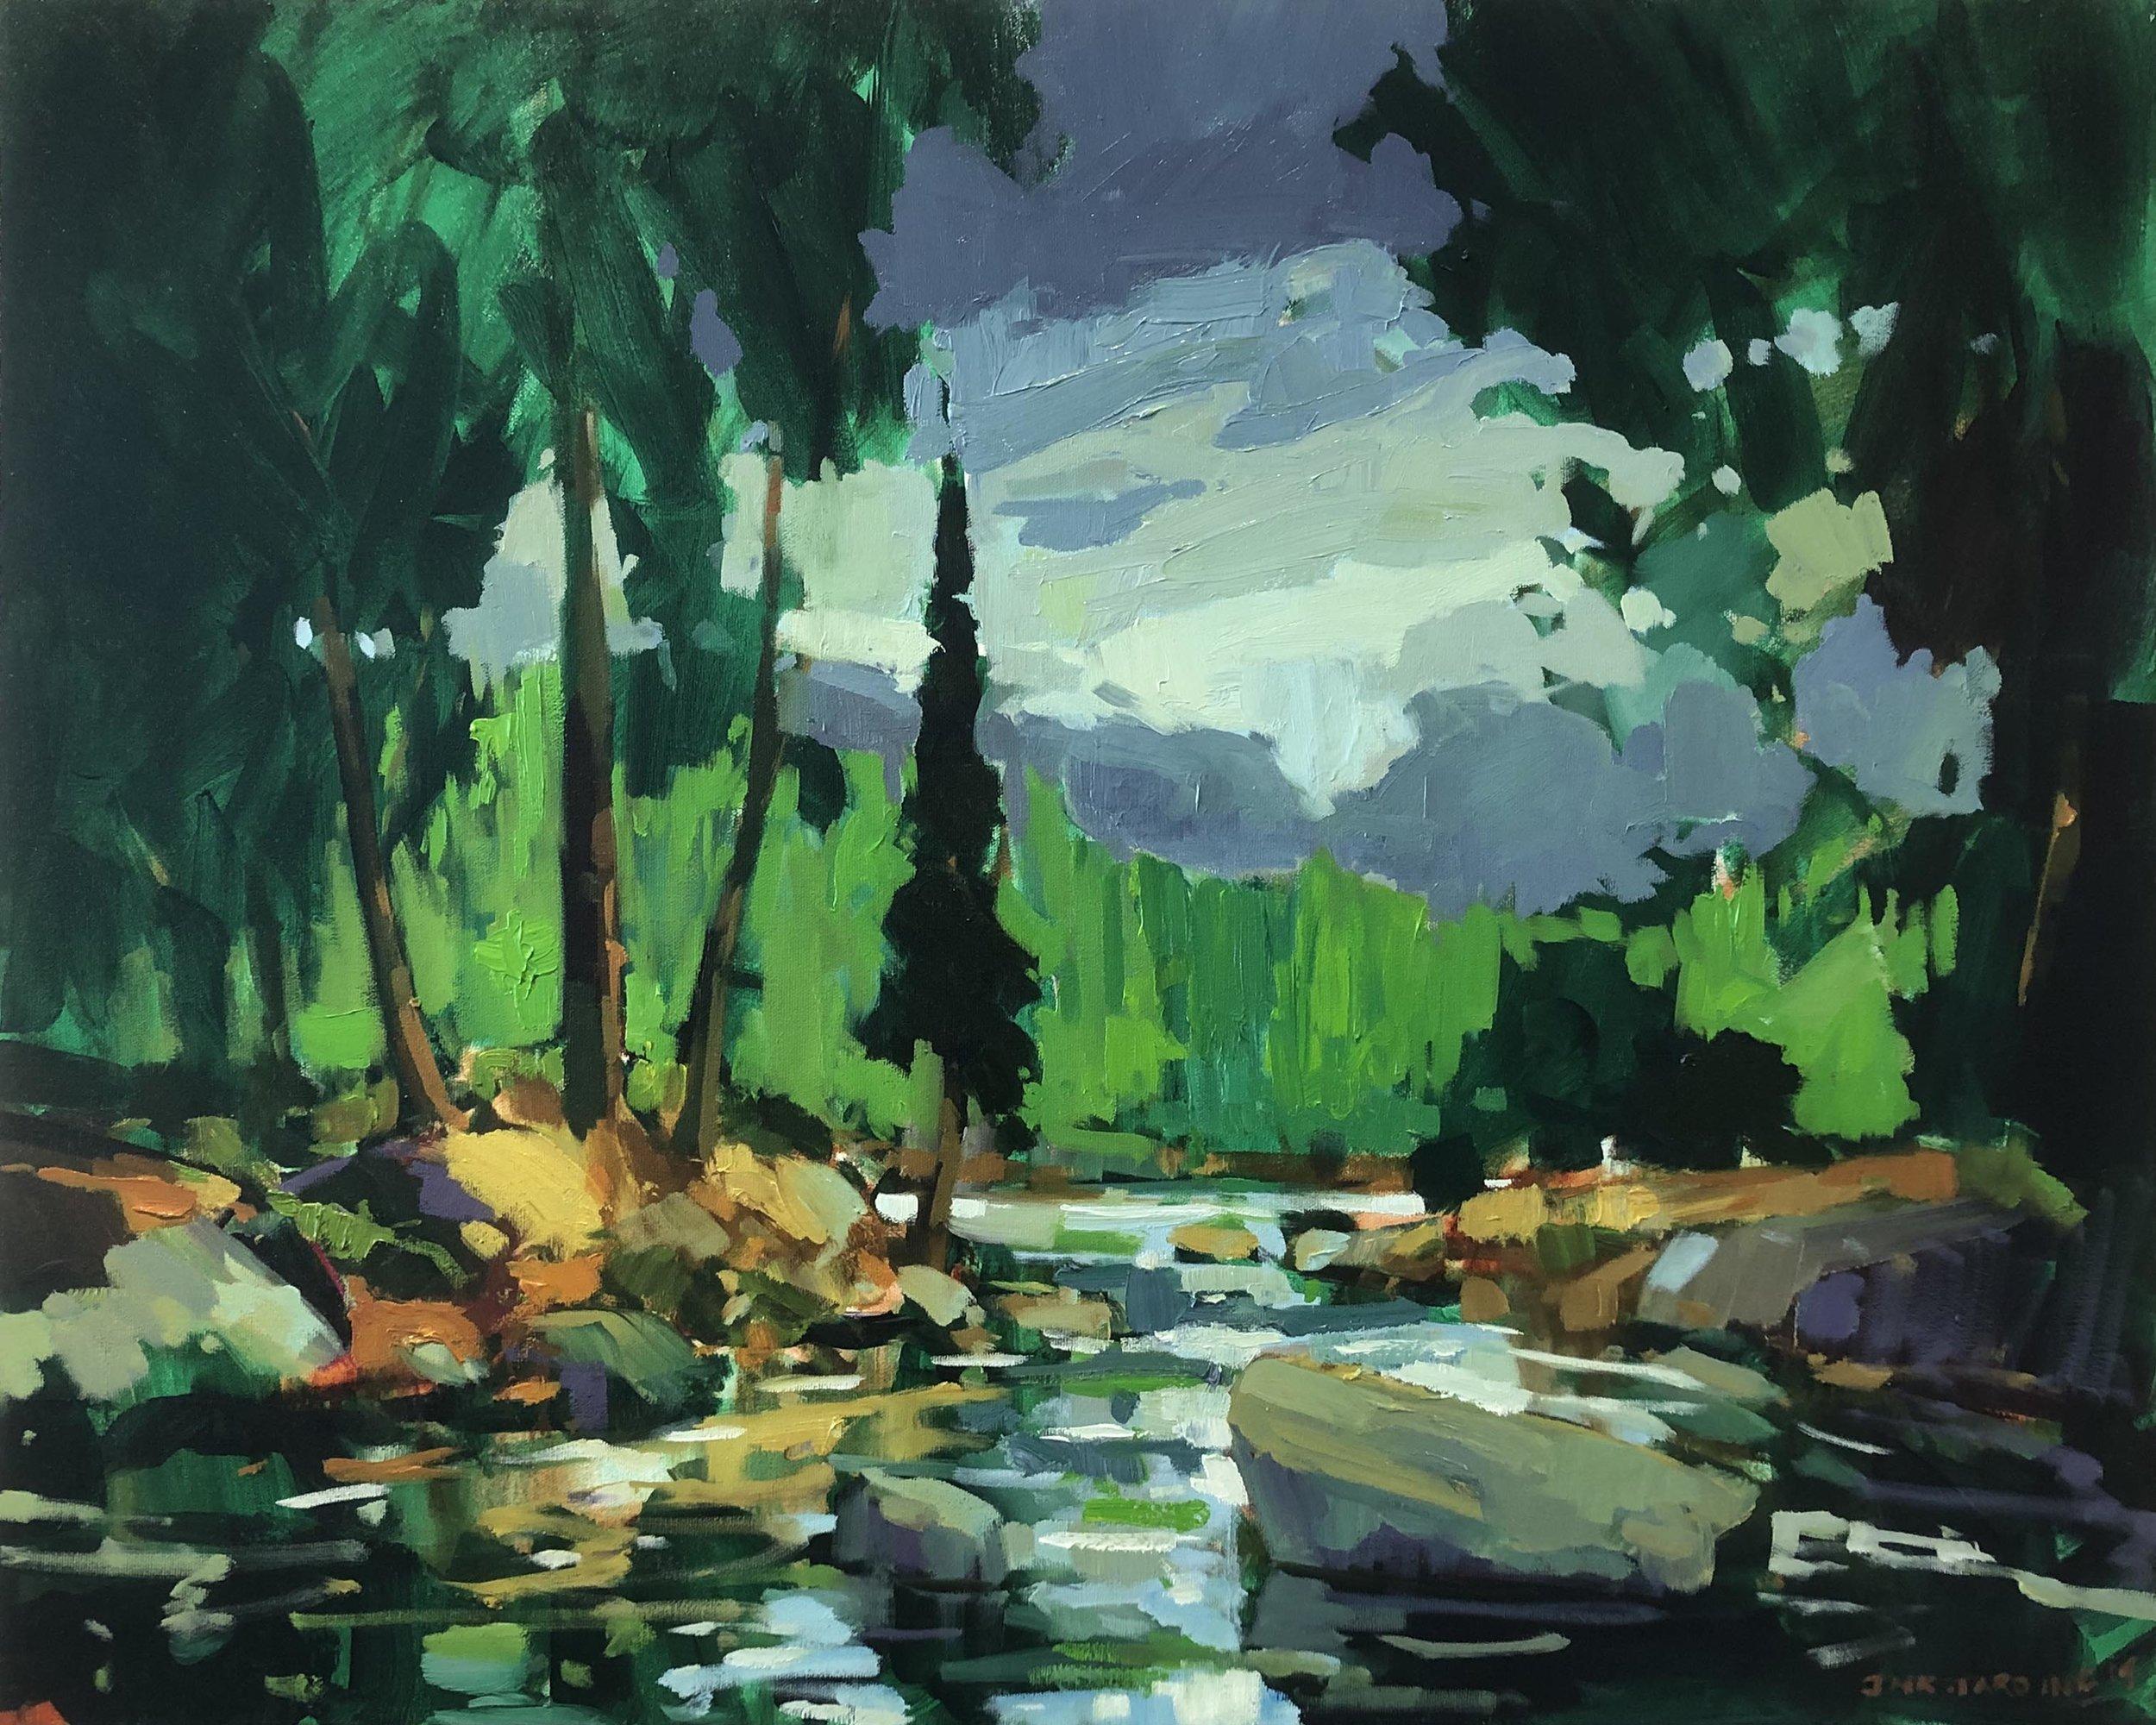 A Quiet Place II by Jamie Jardine